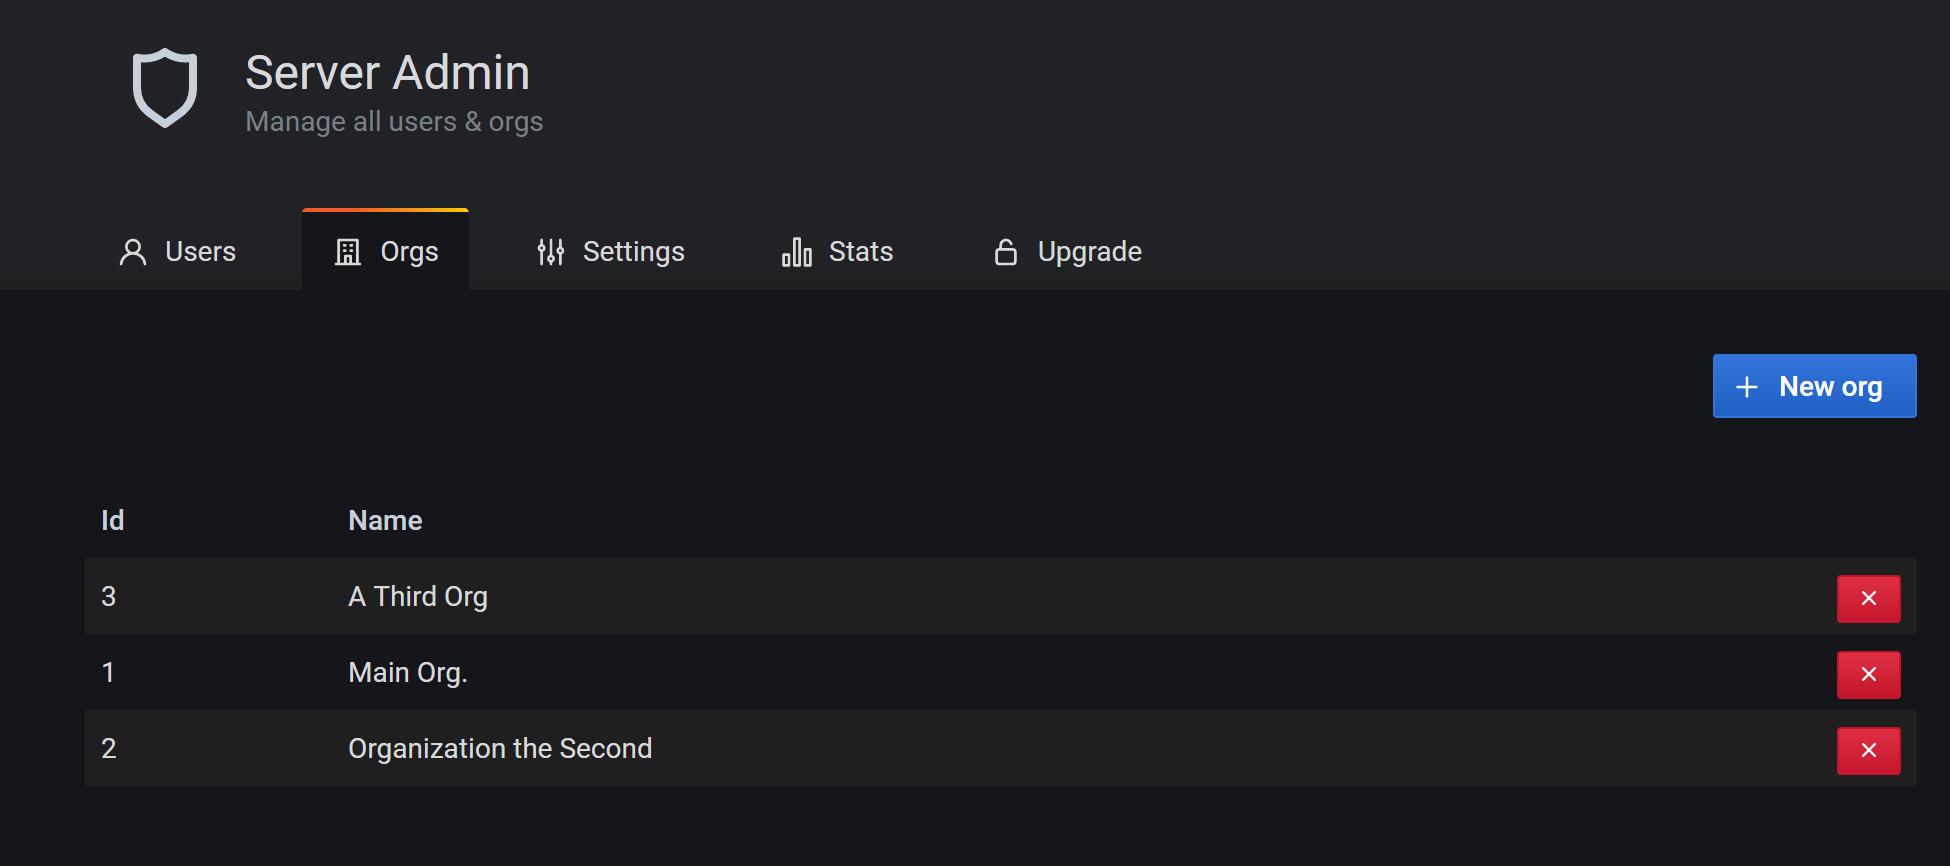 Server Admin organization list